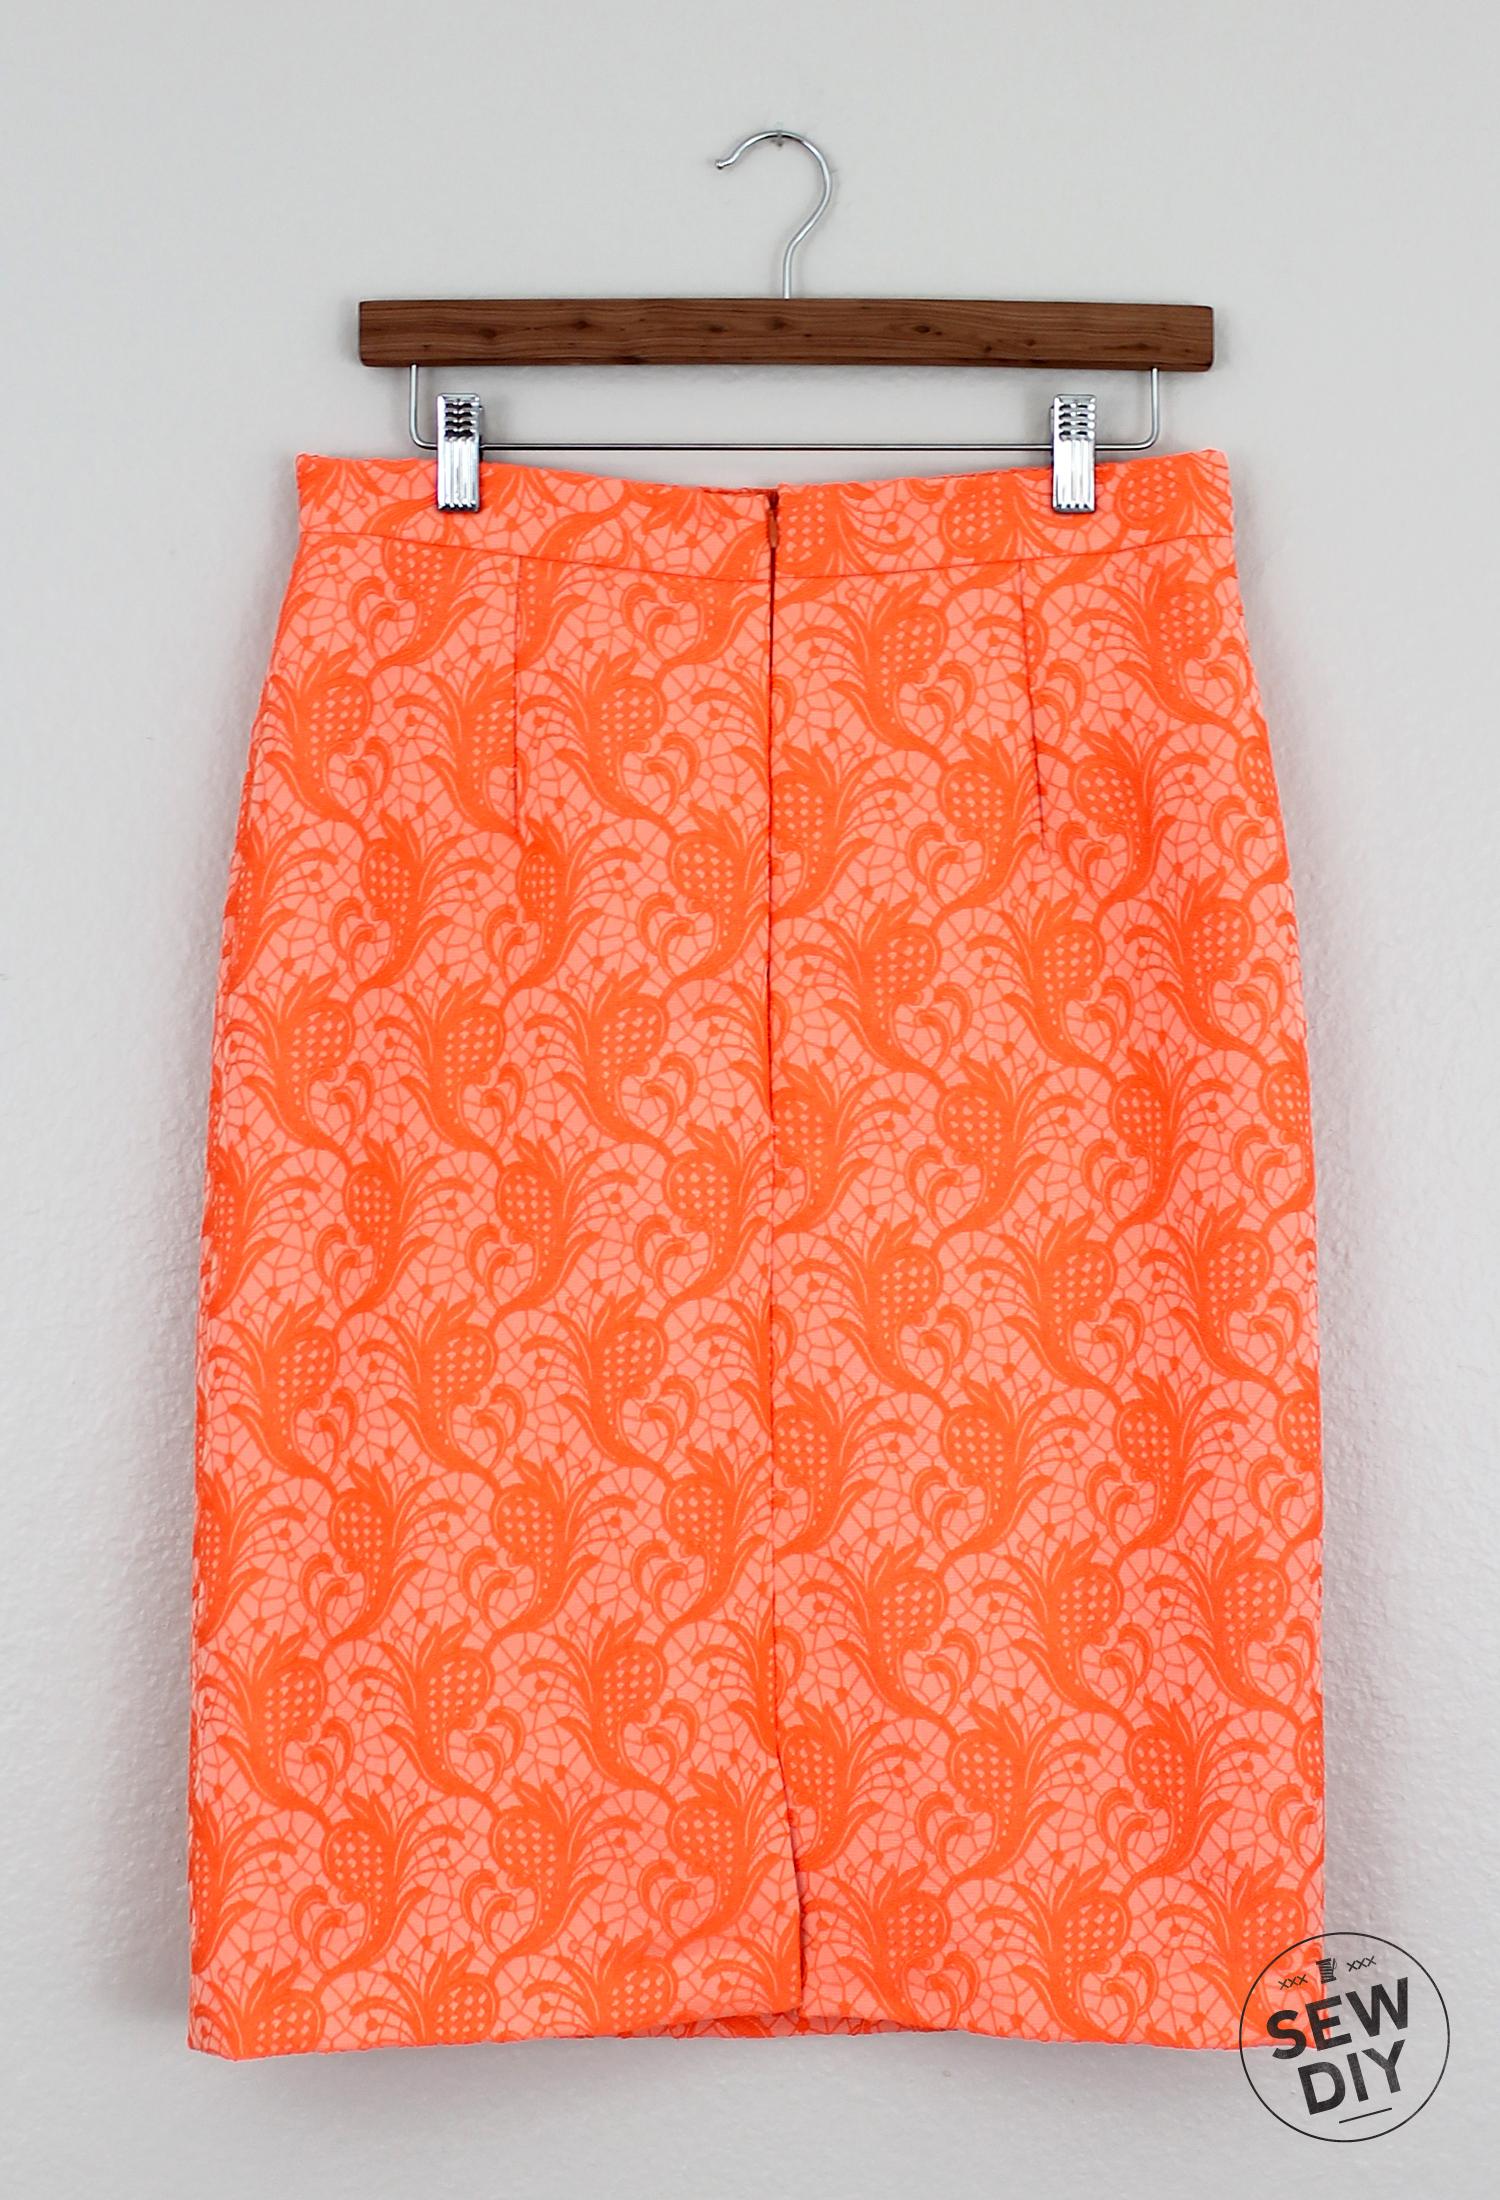 Sew DIY Orange Brocade Skirt Back